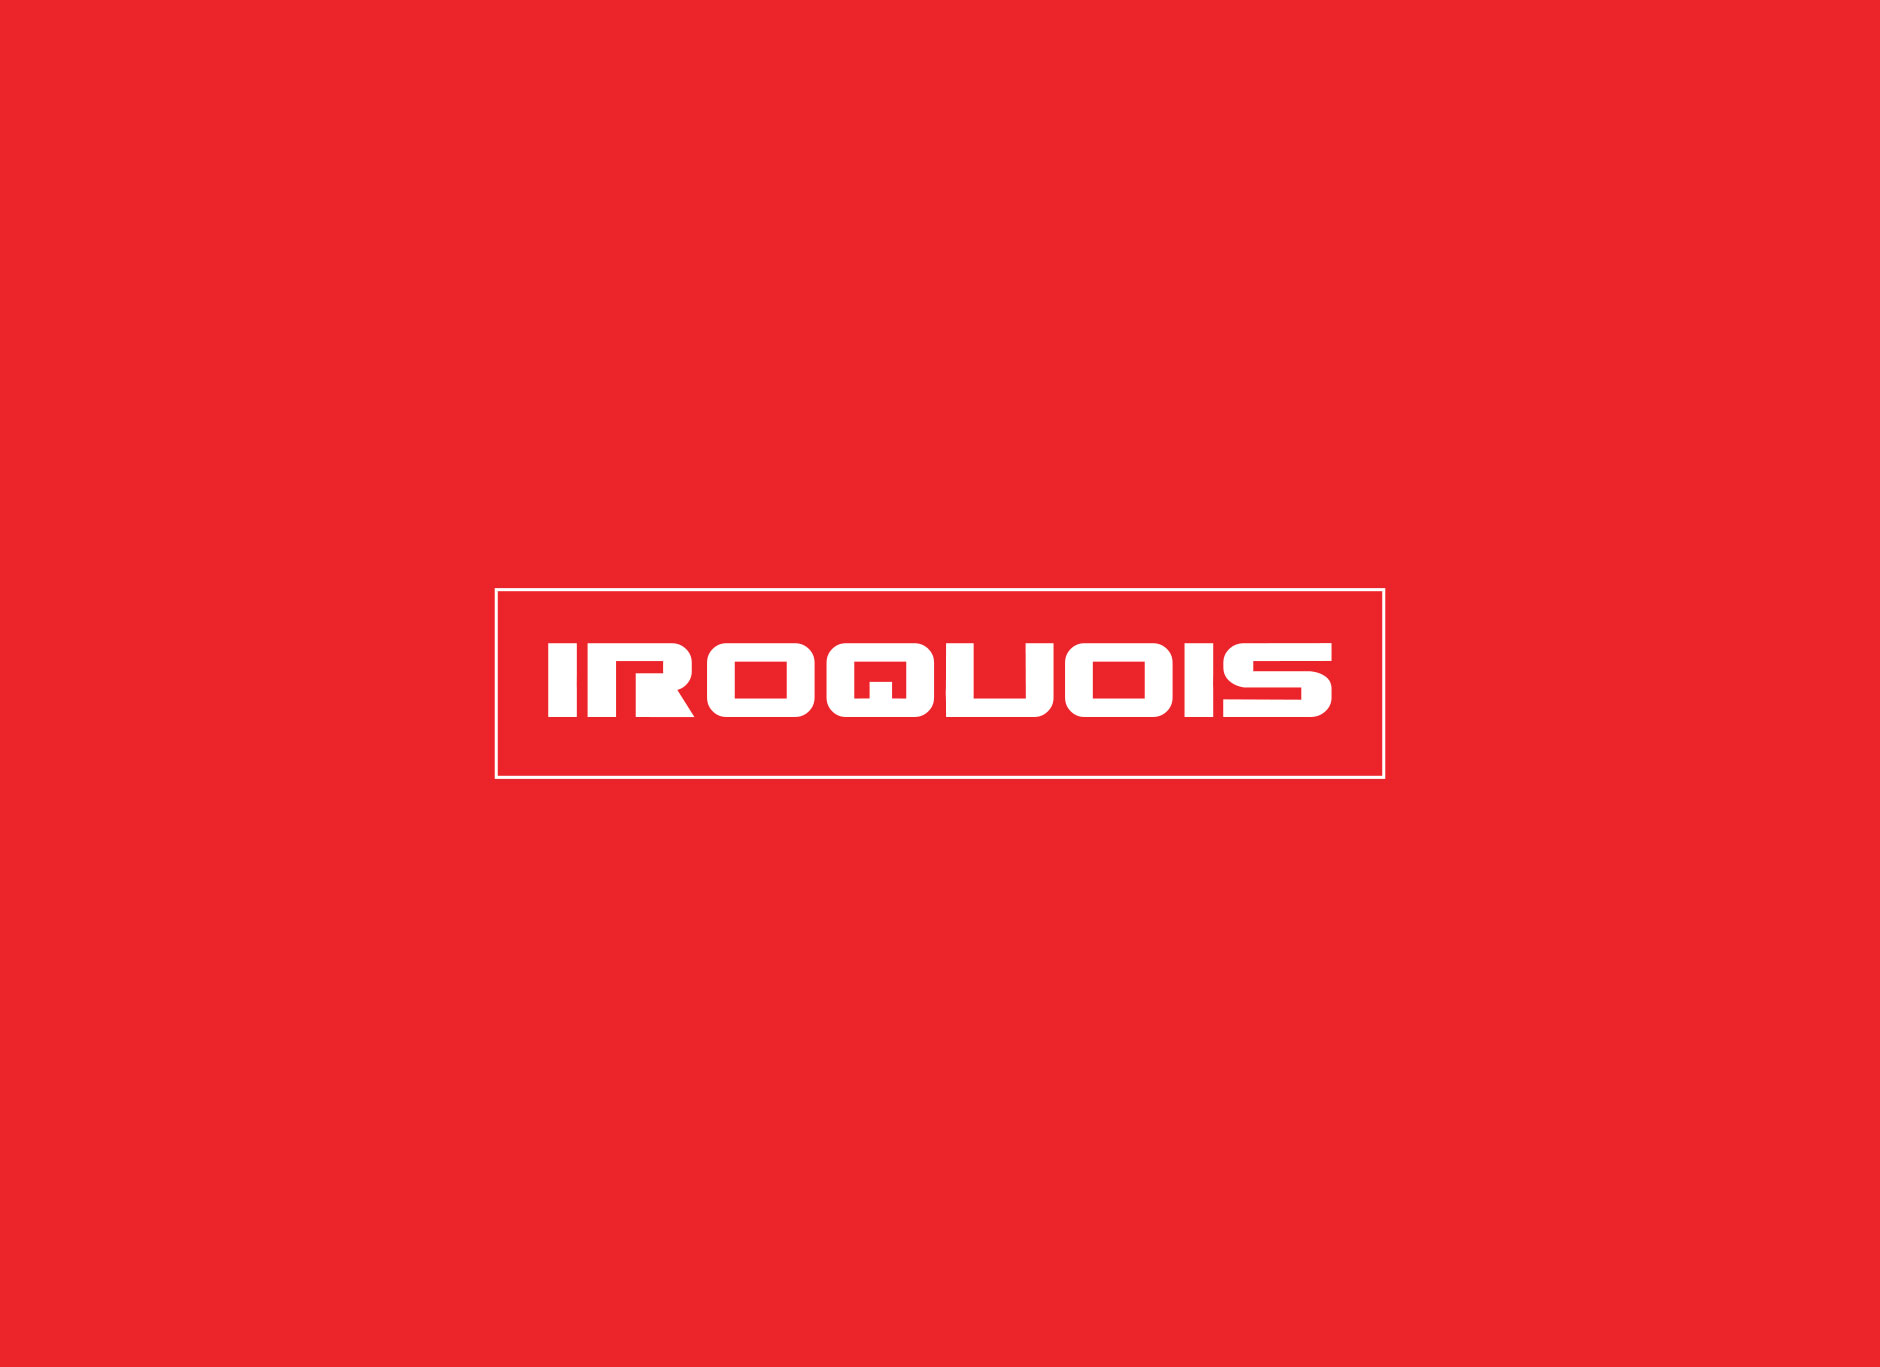 Iroquois-1880-logo